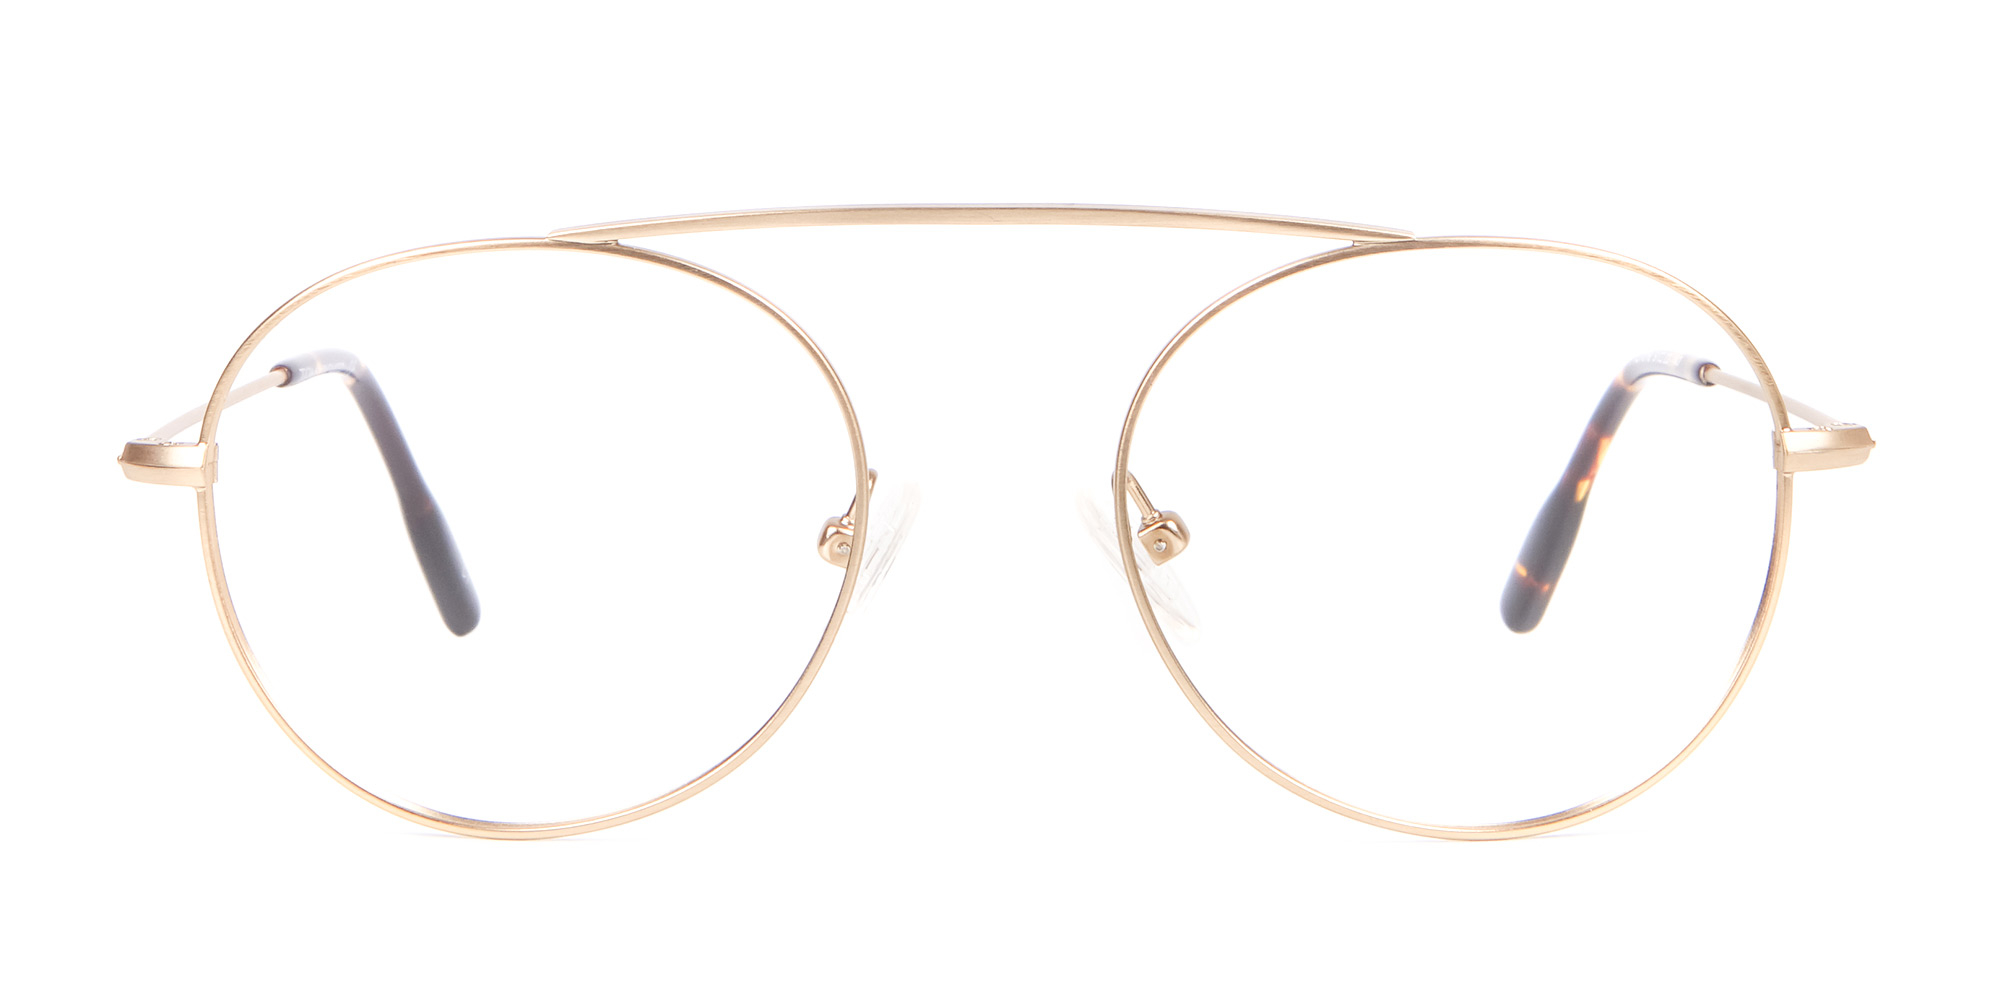 Gold Bridgeless Glasses in Retro Round Frame